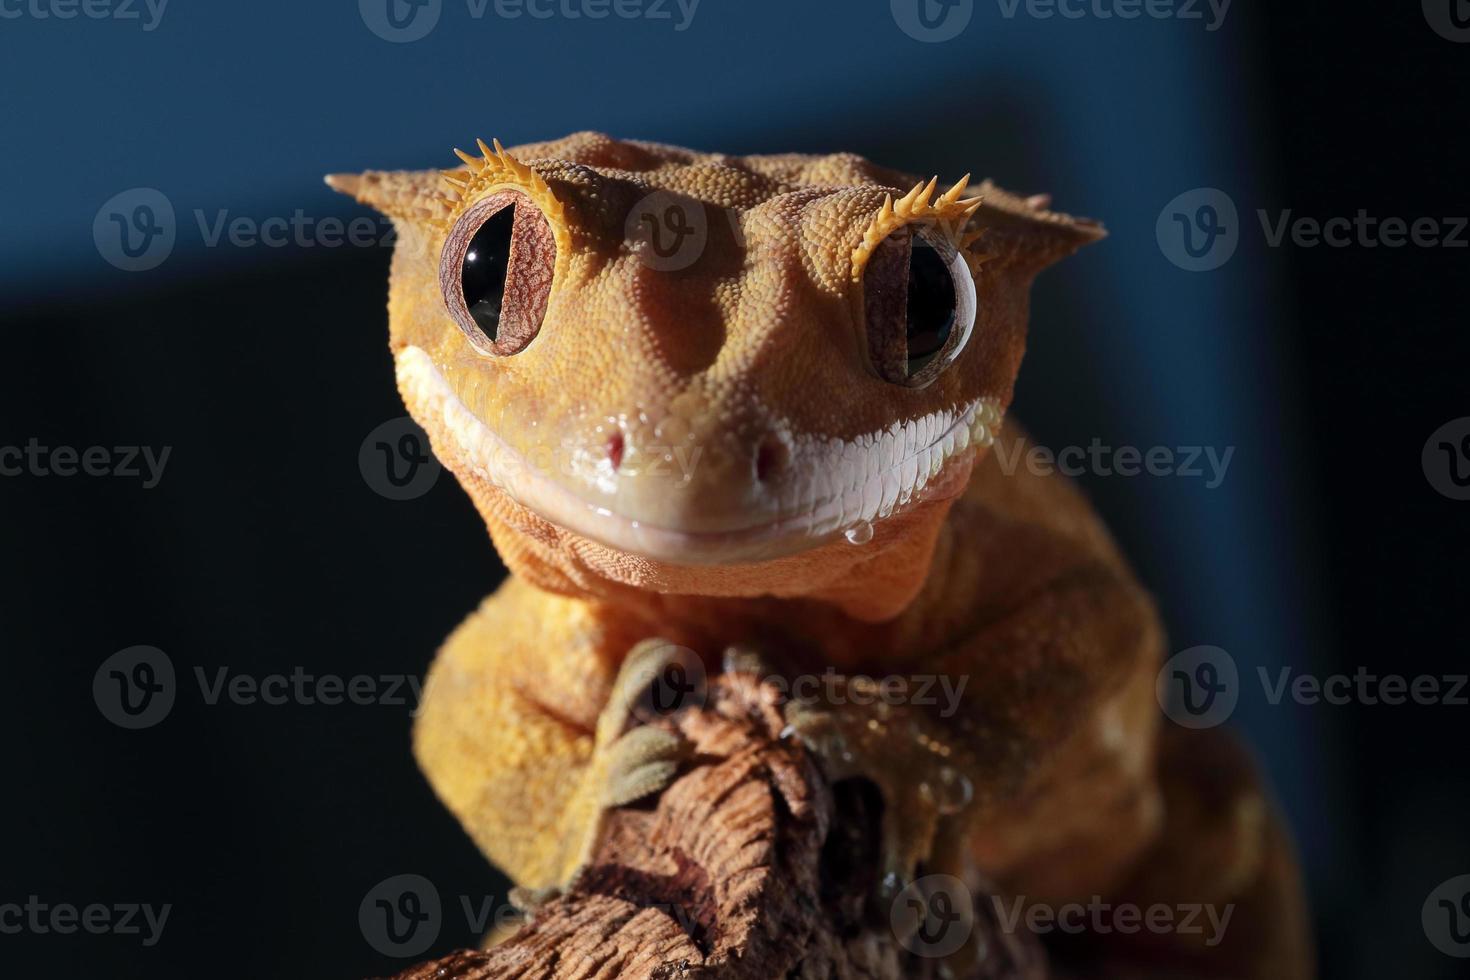 Caledonian created gecko gazing into camera photo